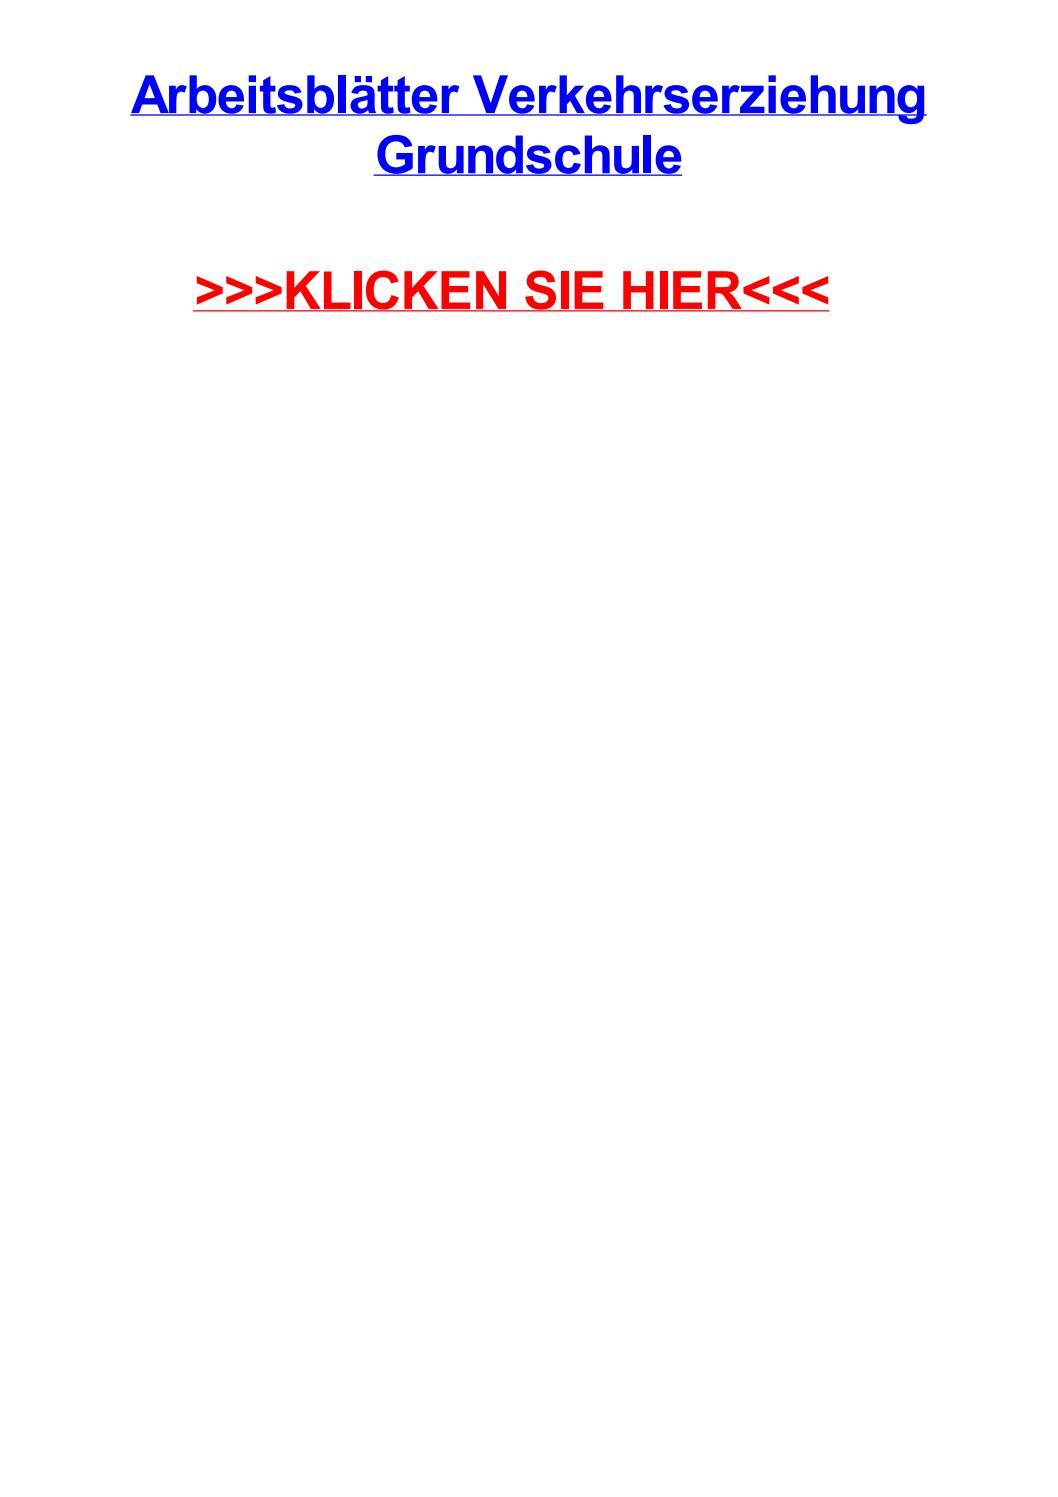 Großzügig Zellenergie Arbeitsblatt Antworten Bilder - Super Lehrer ...